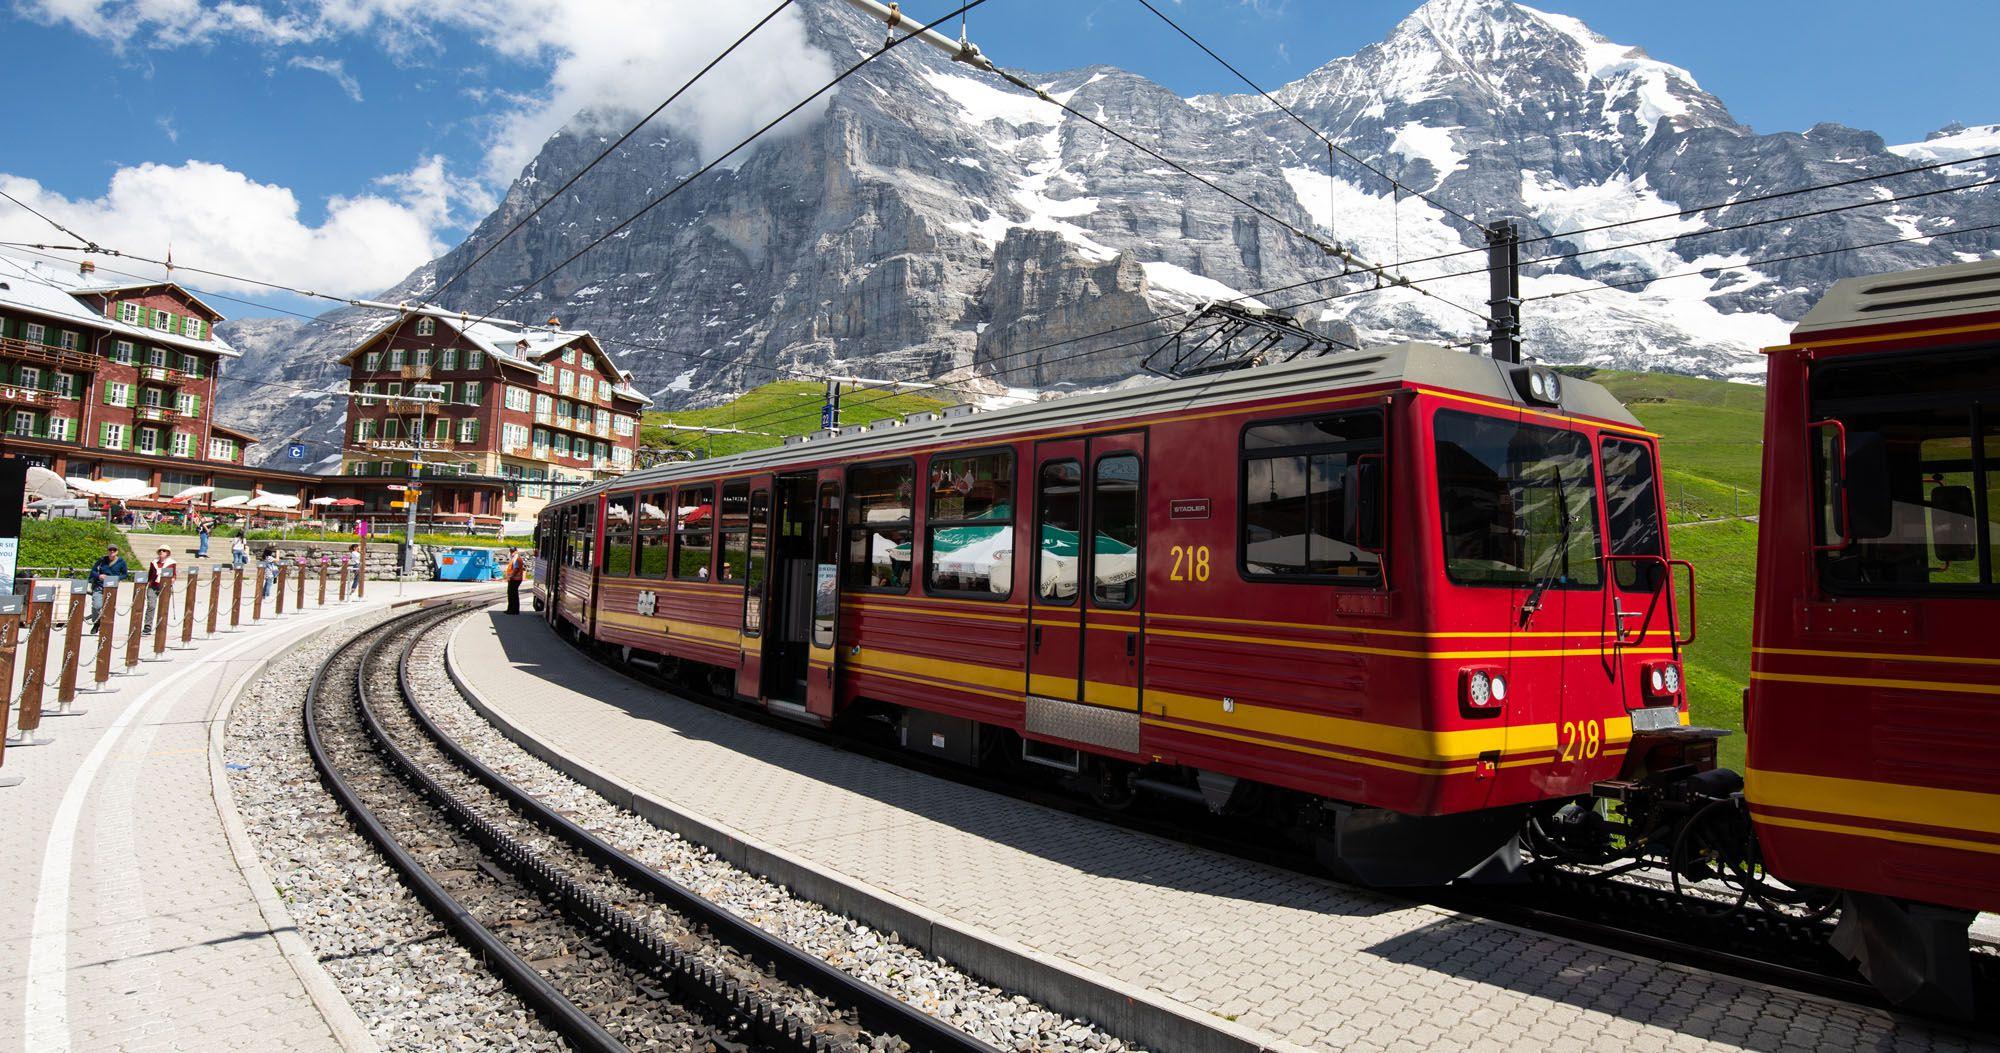 Jungfraujoch or Schilthorn